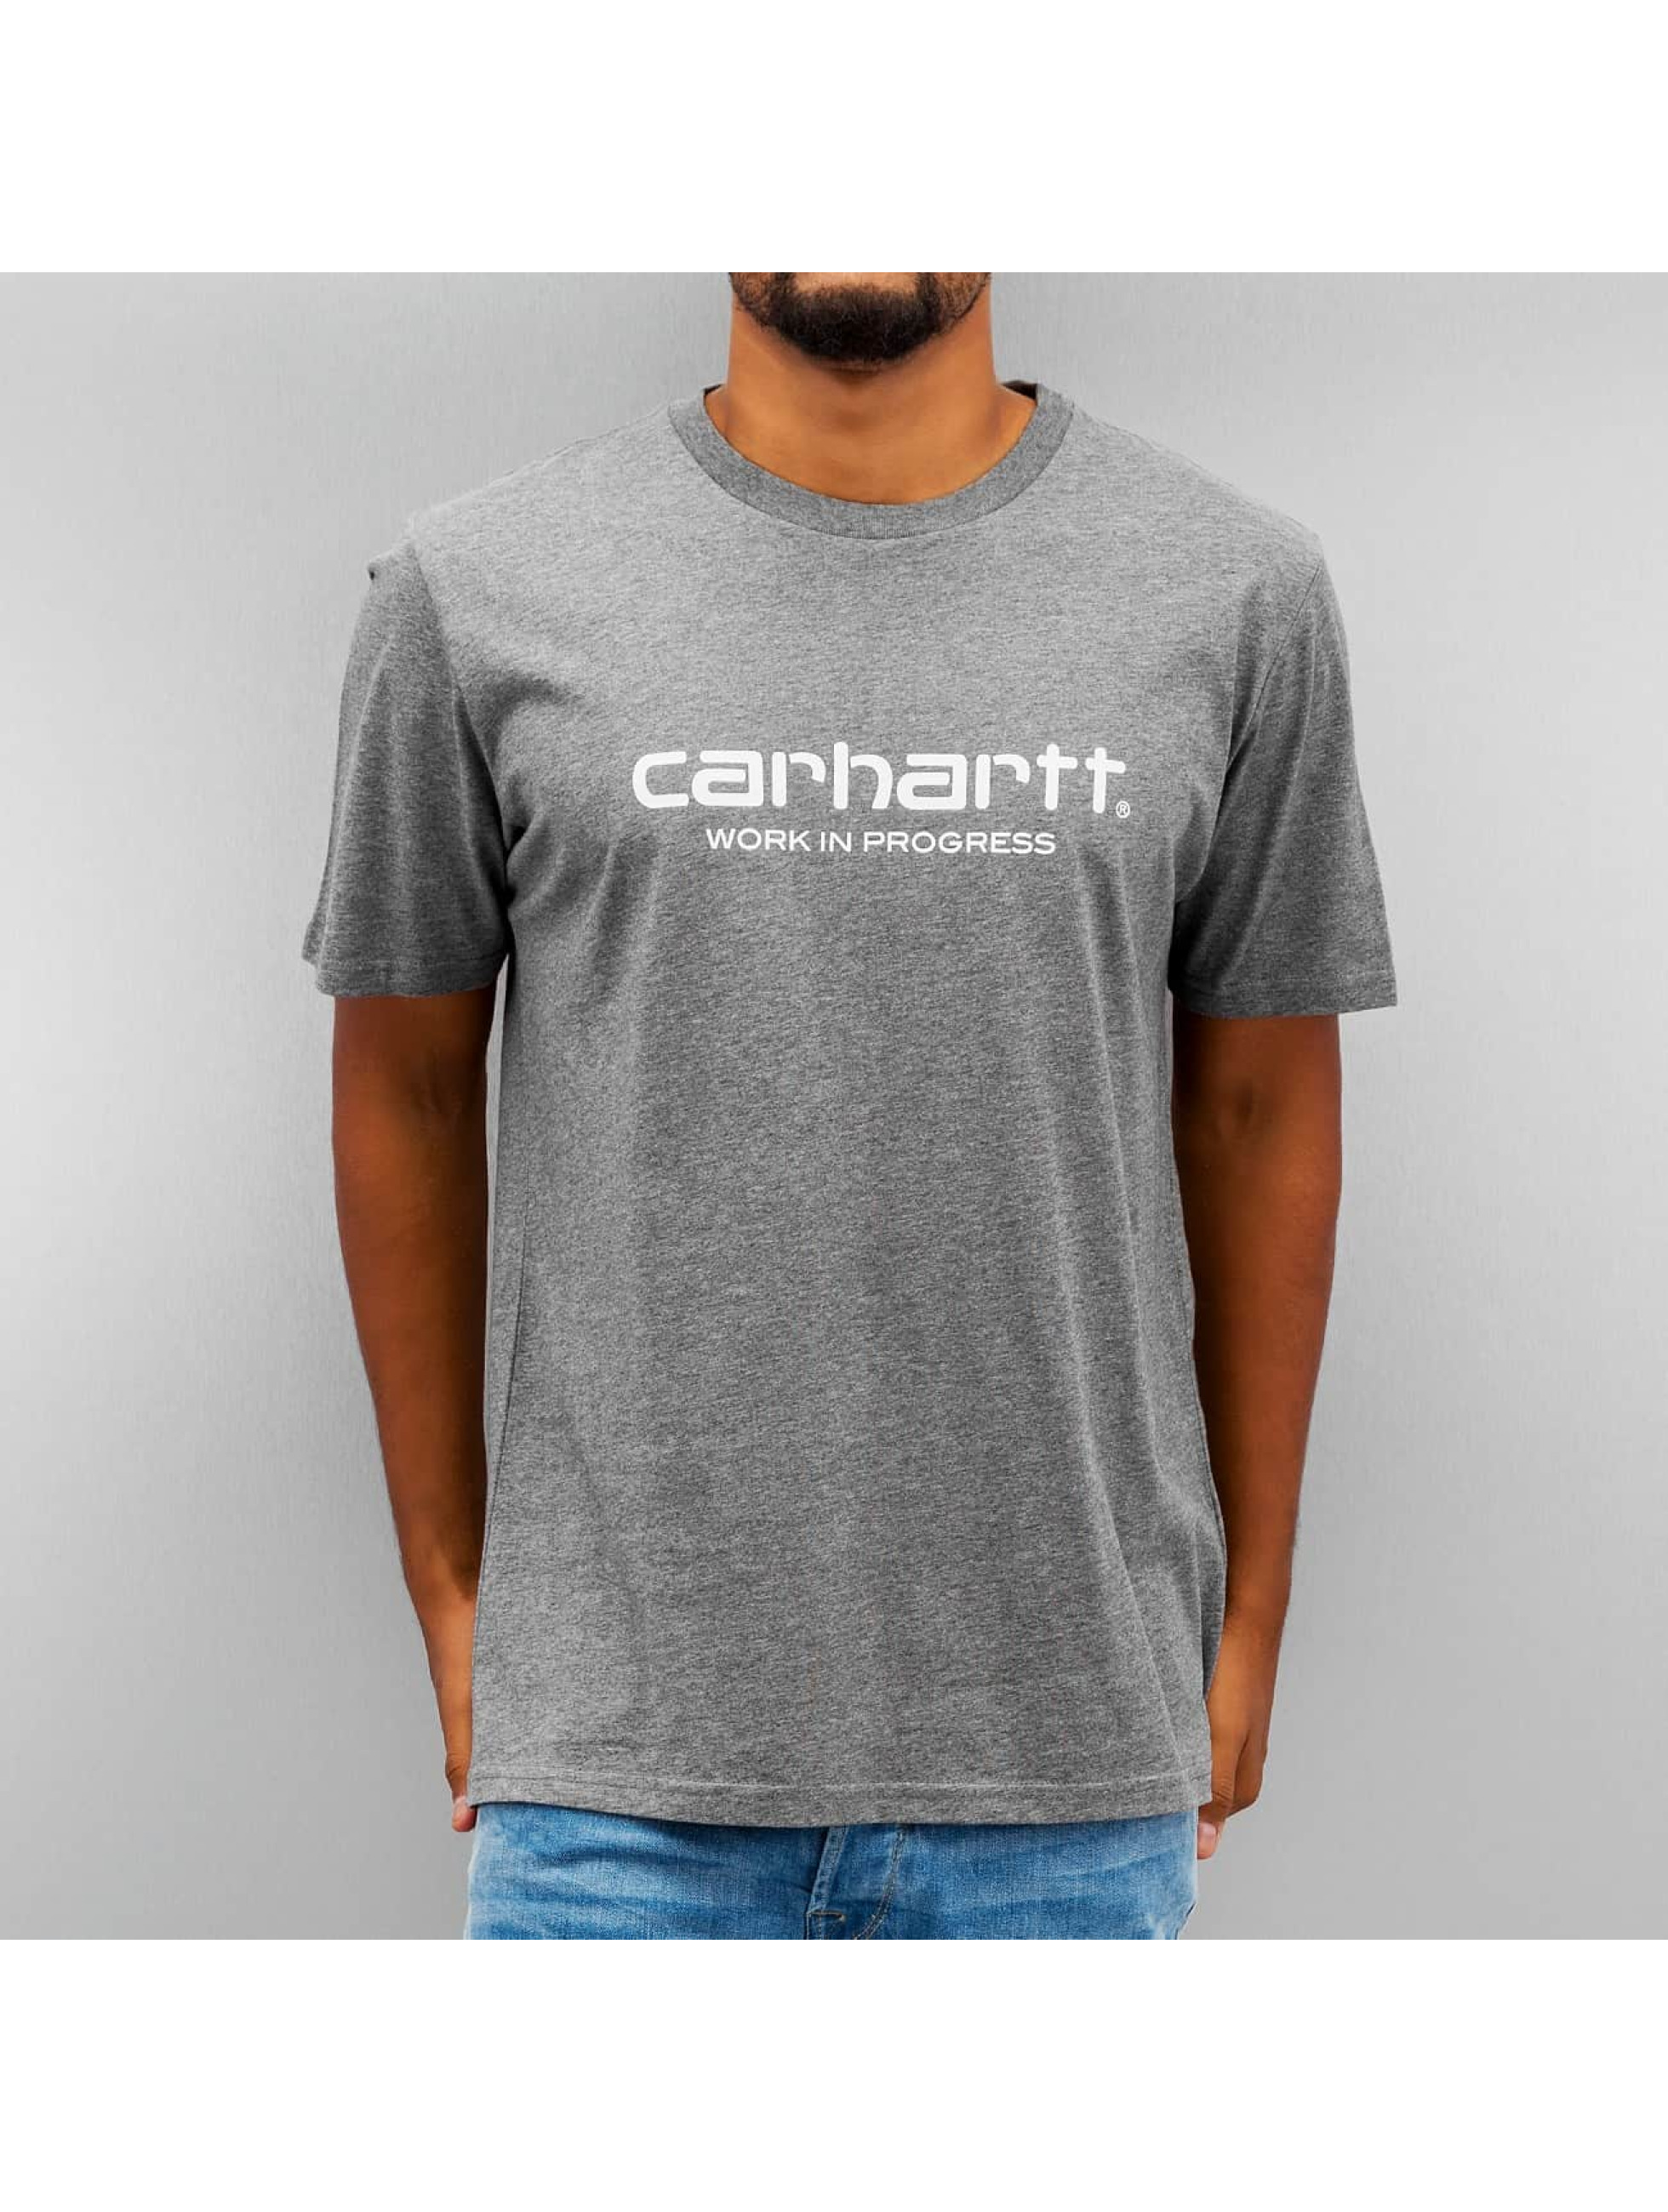 Carhartt WIP T-Shirt S/S Wip Script grey